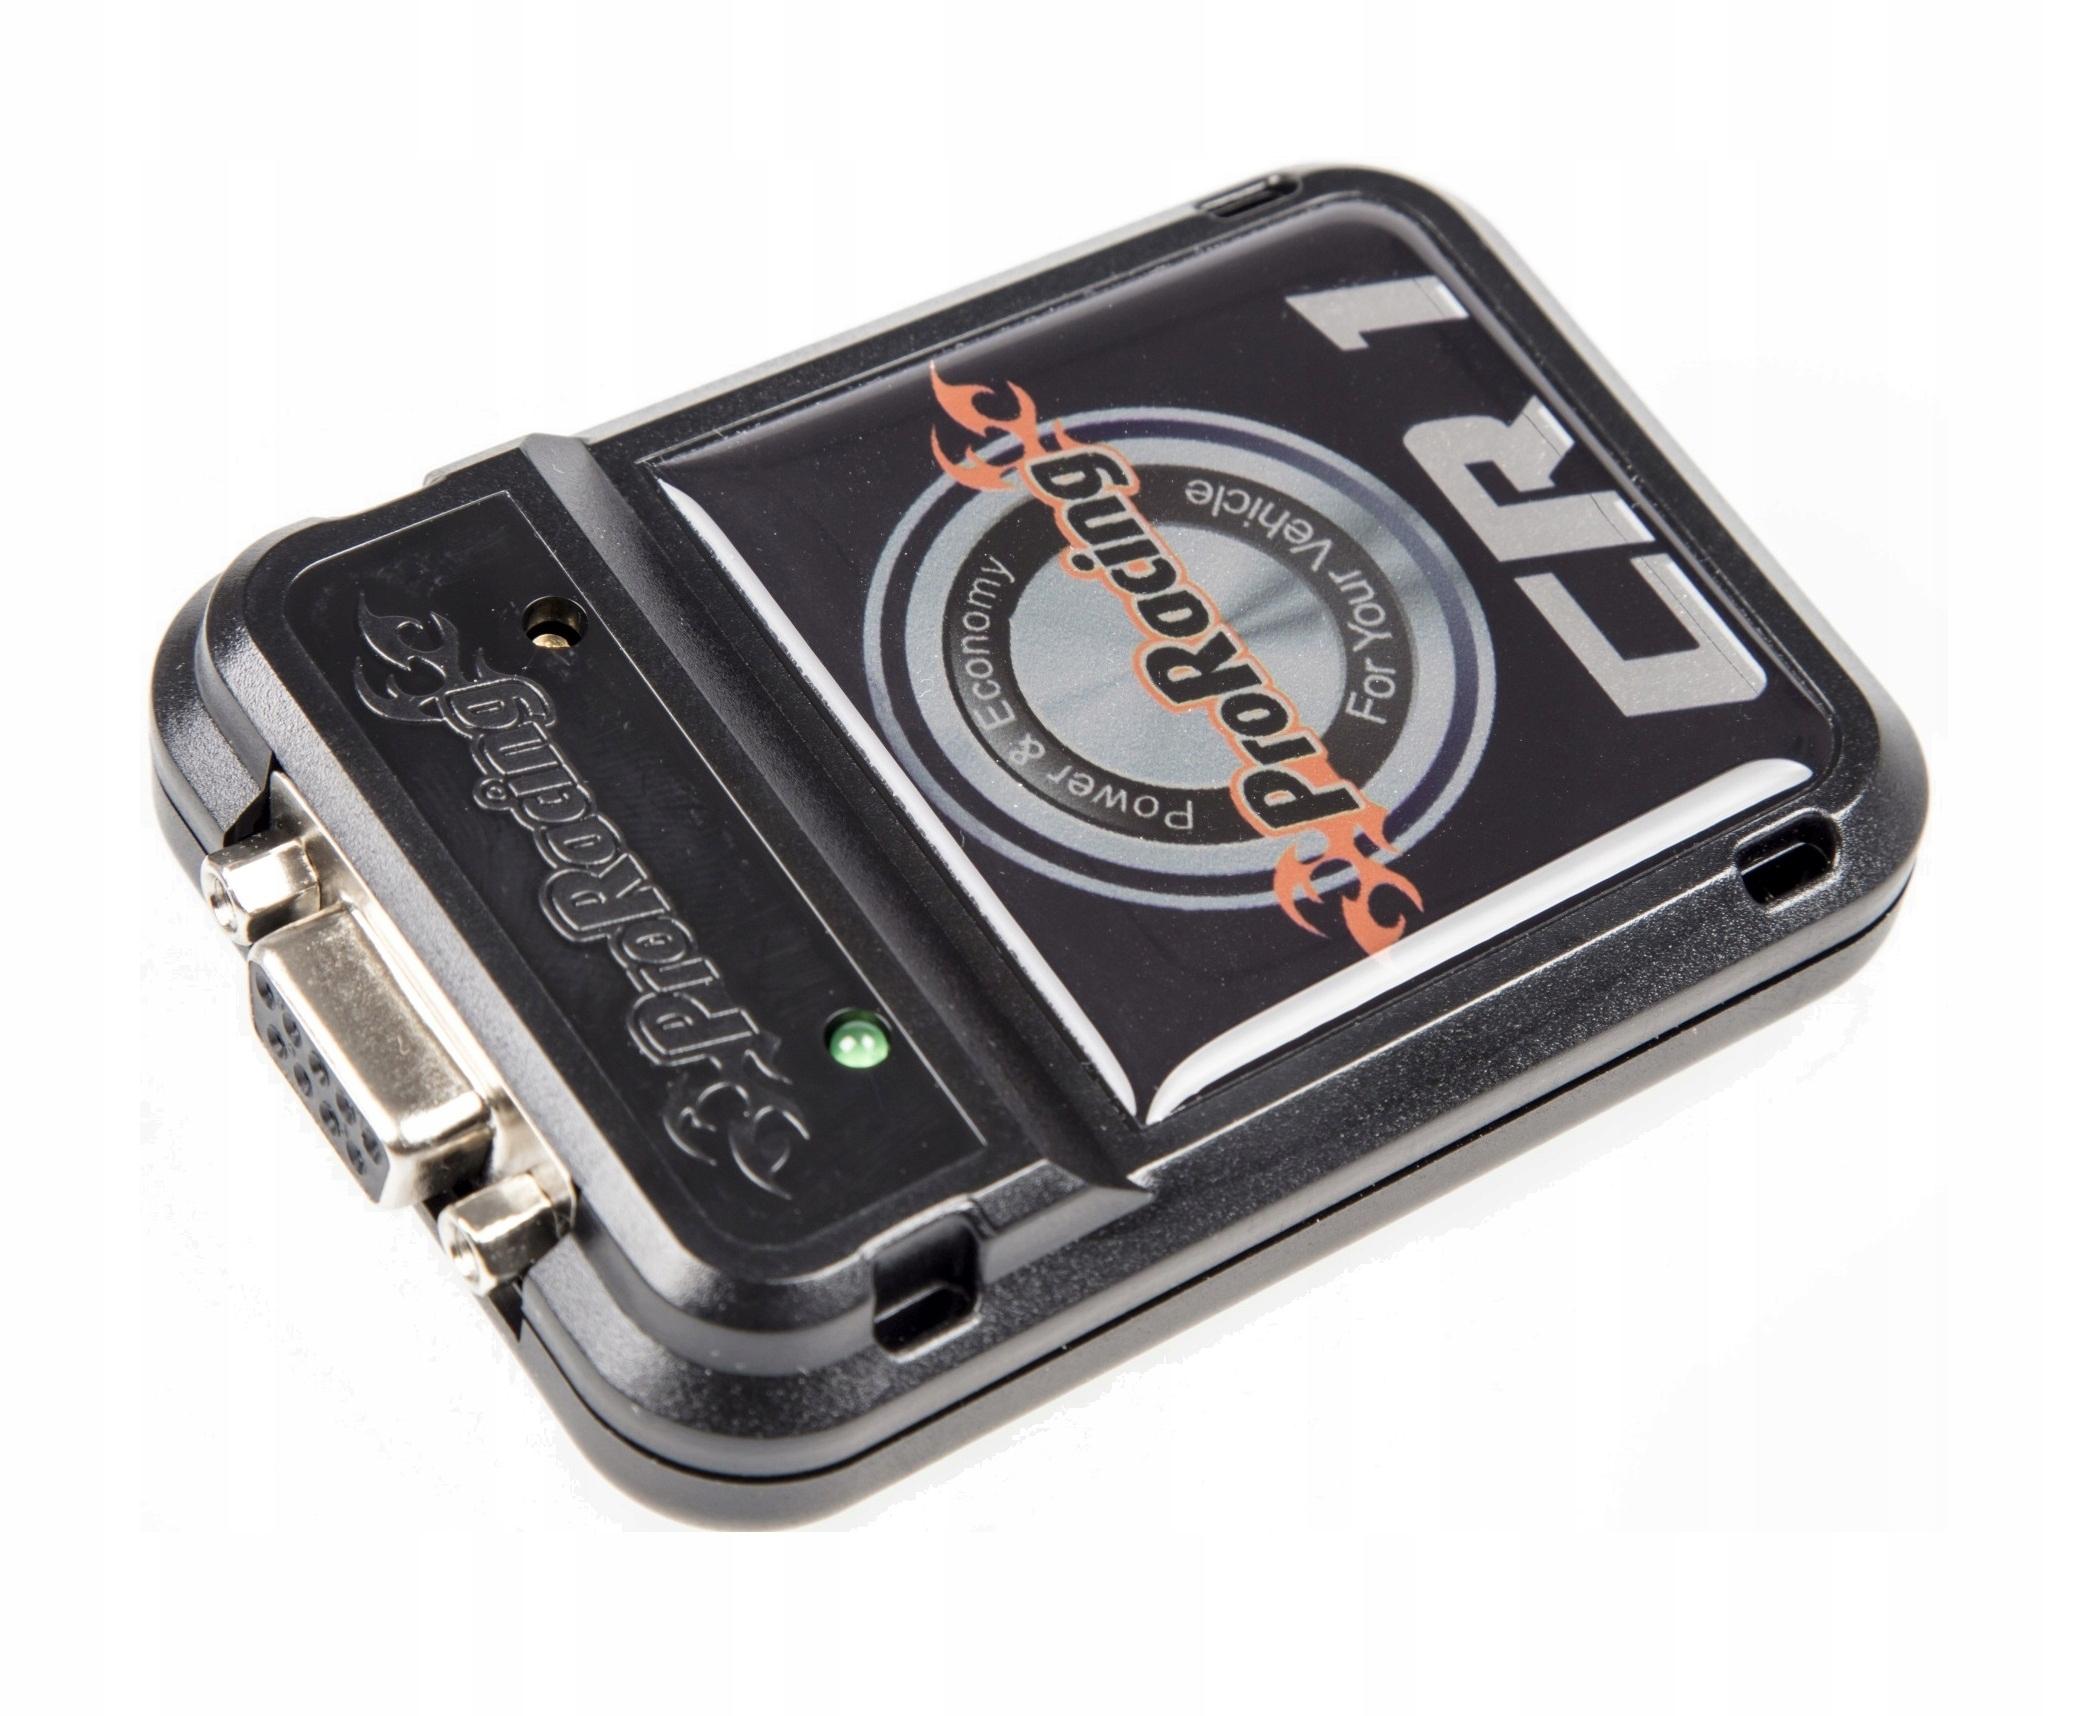 чип box ford ranger iv v 22 23 25 30 32 tdci